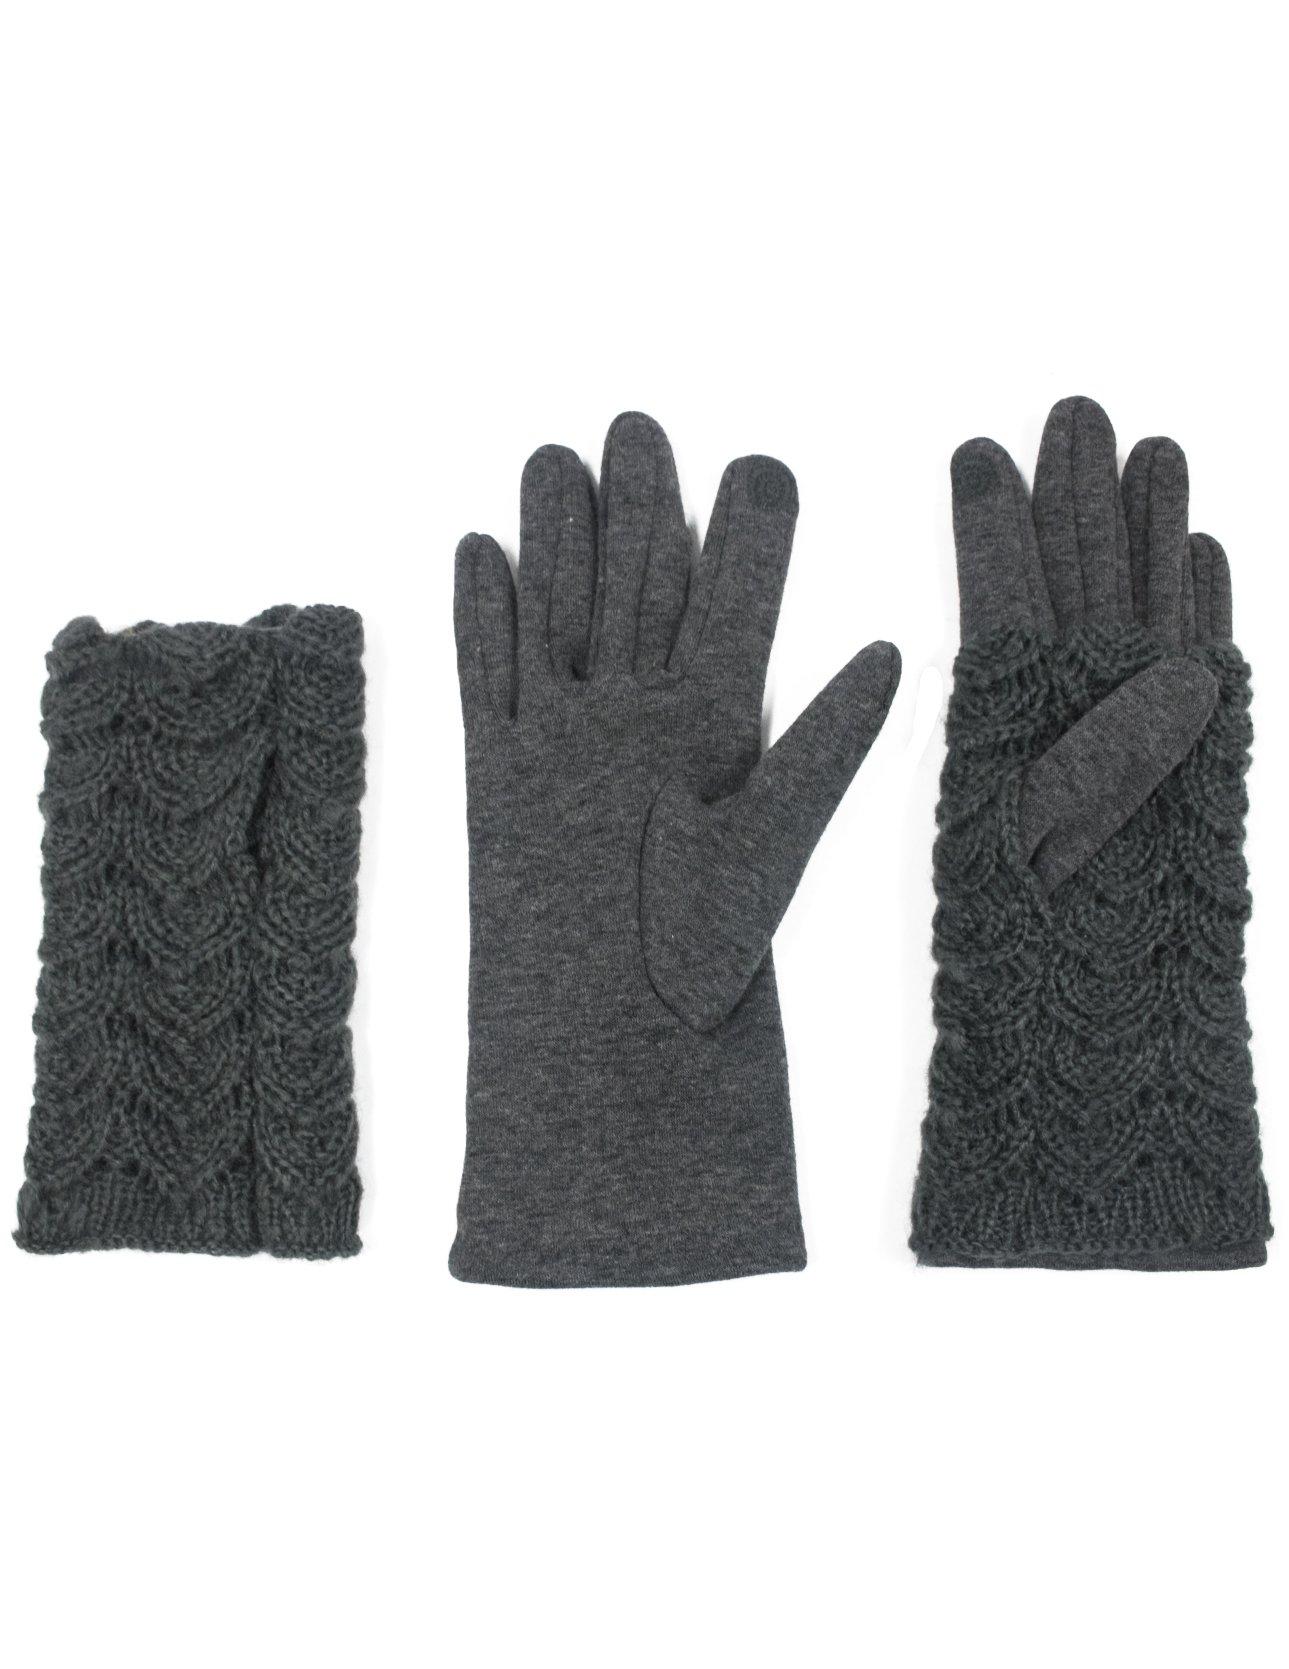 Dahlia Women's Lined Touchscreen Gloves - 2 in 1 Hand Warmer Gloves - Gray